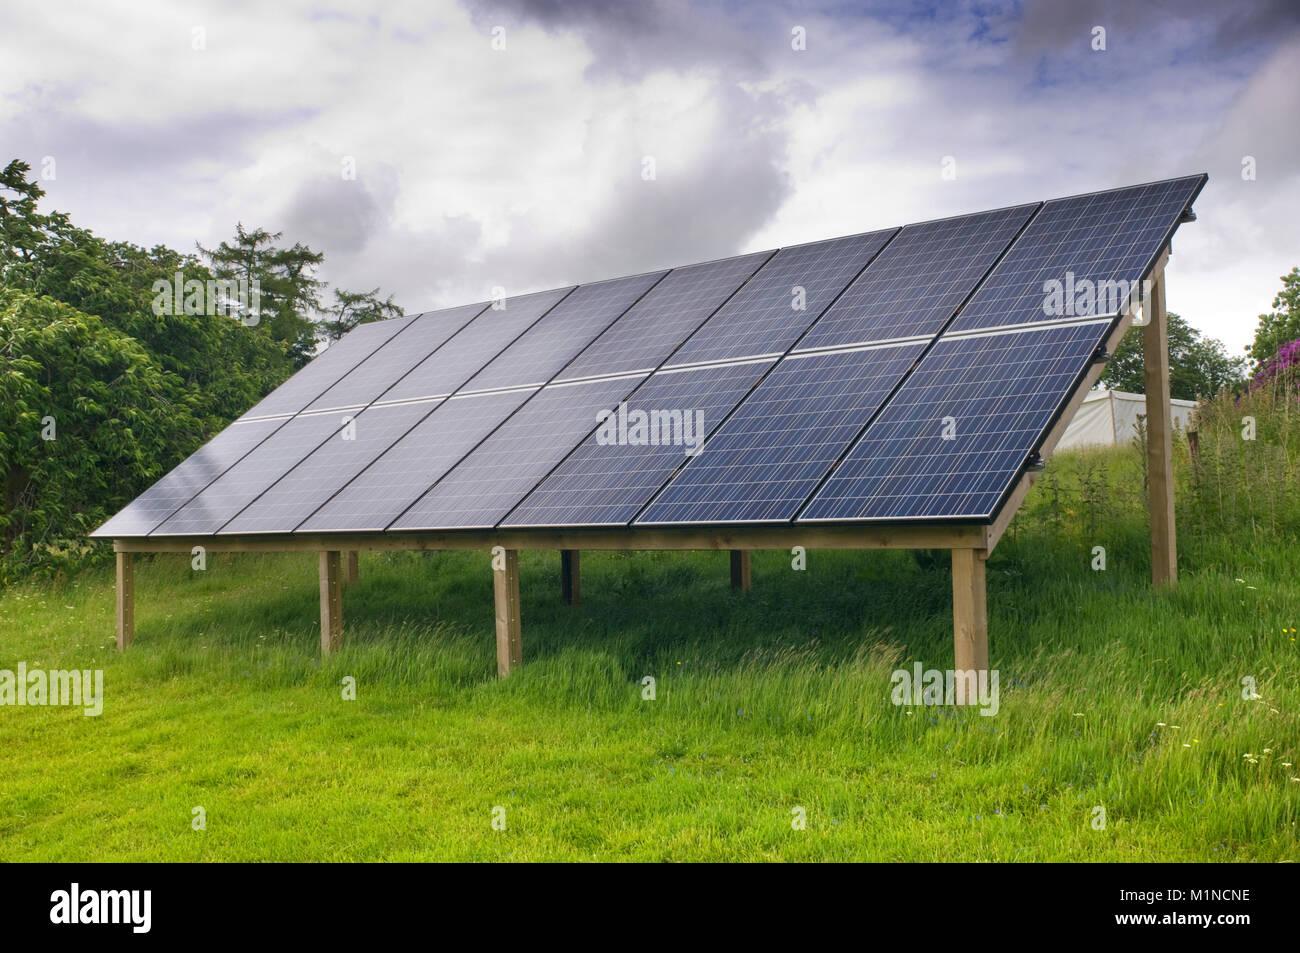 Conjunto de pequeños paneles solares - John Gollop Imagen De Stock